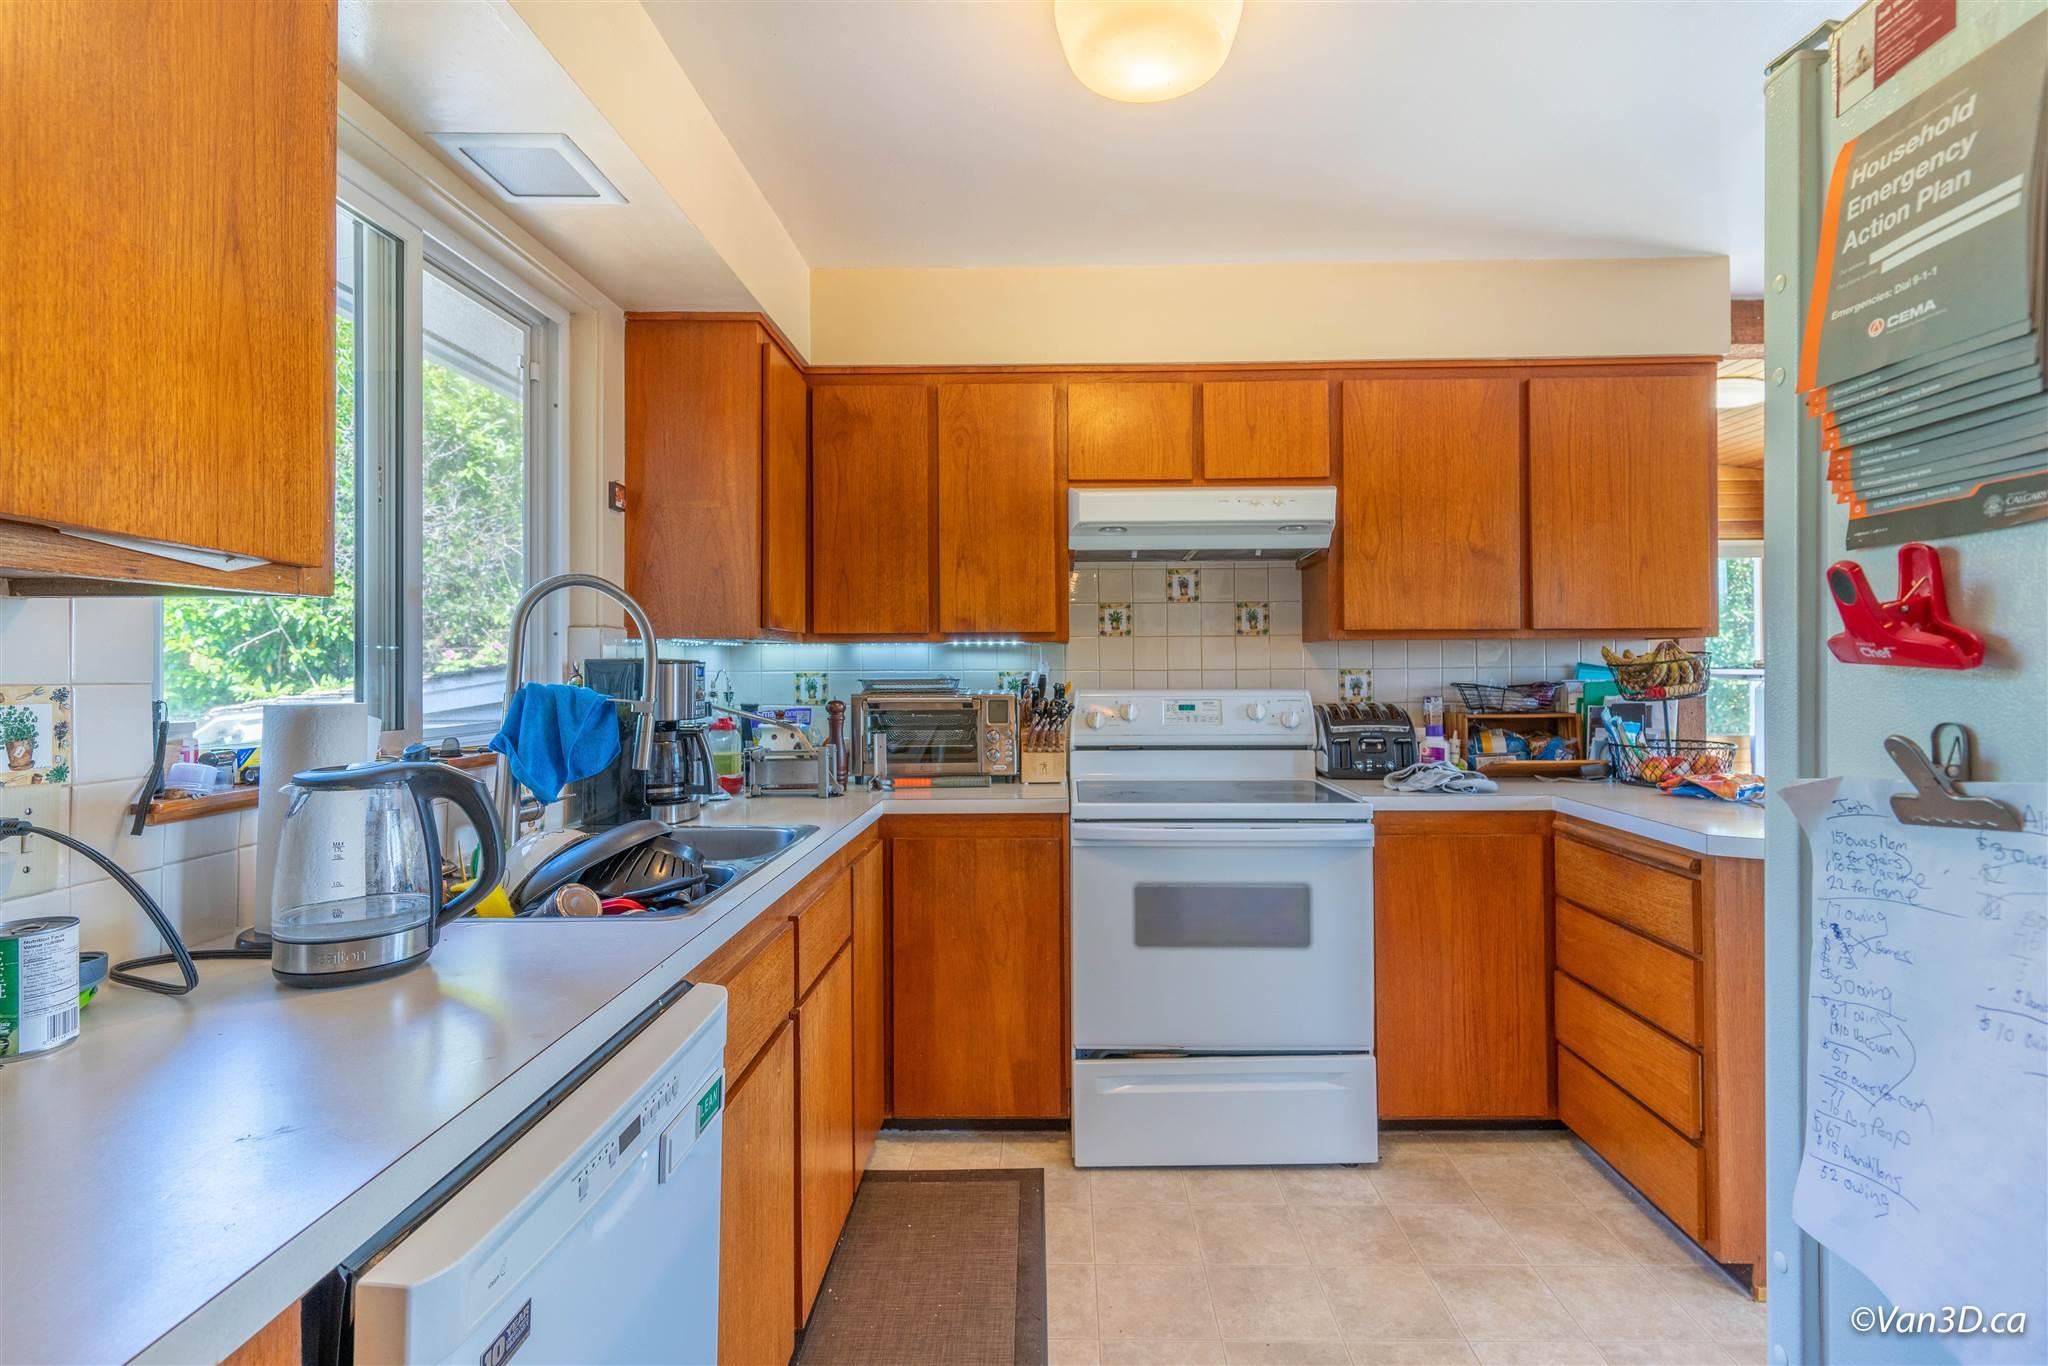 14495 MANN PARK CRESCENT - White Rock House/Single Family for sale, 4 Bedrooms (R2604561) - #30